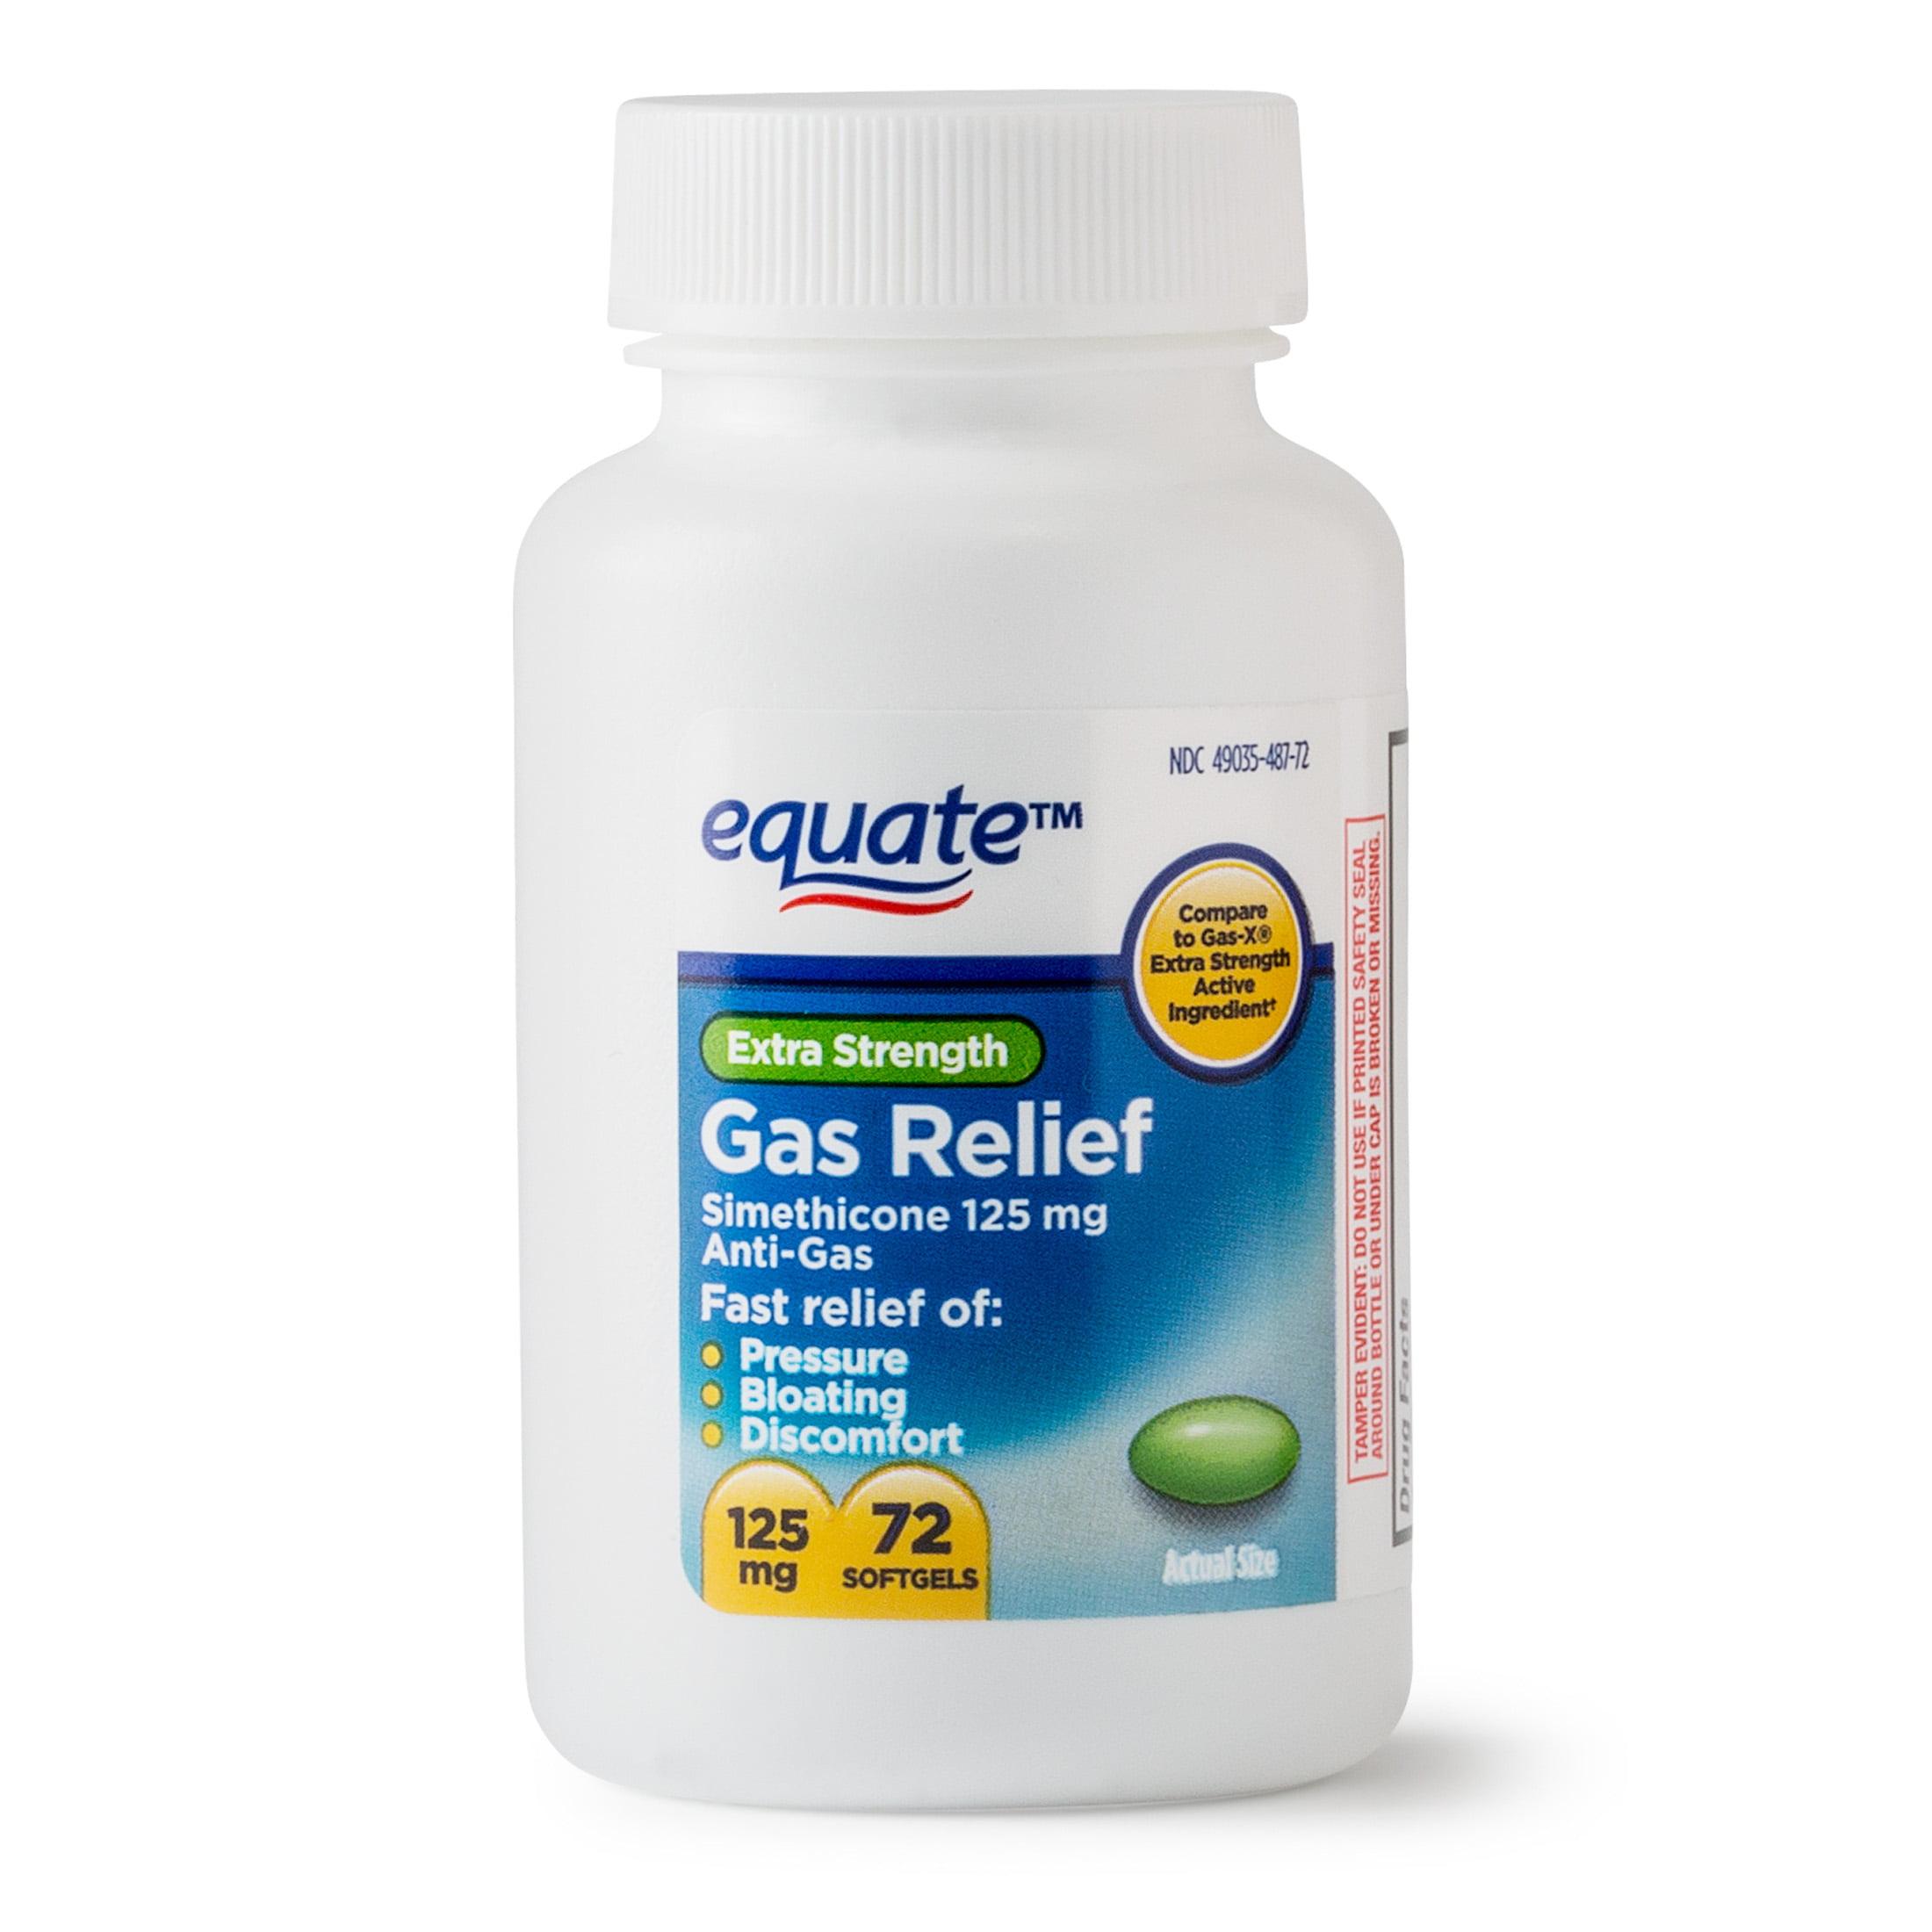 Equate Extra Strength Gas Relief Simethicone Softgels, 125 mg, 72 Ct